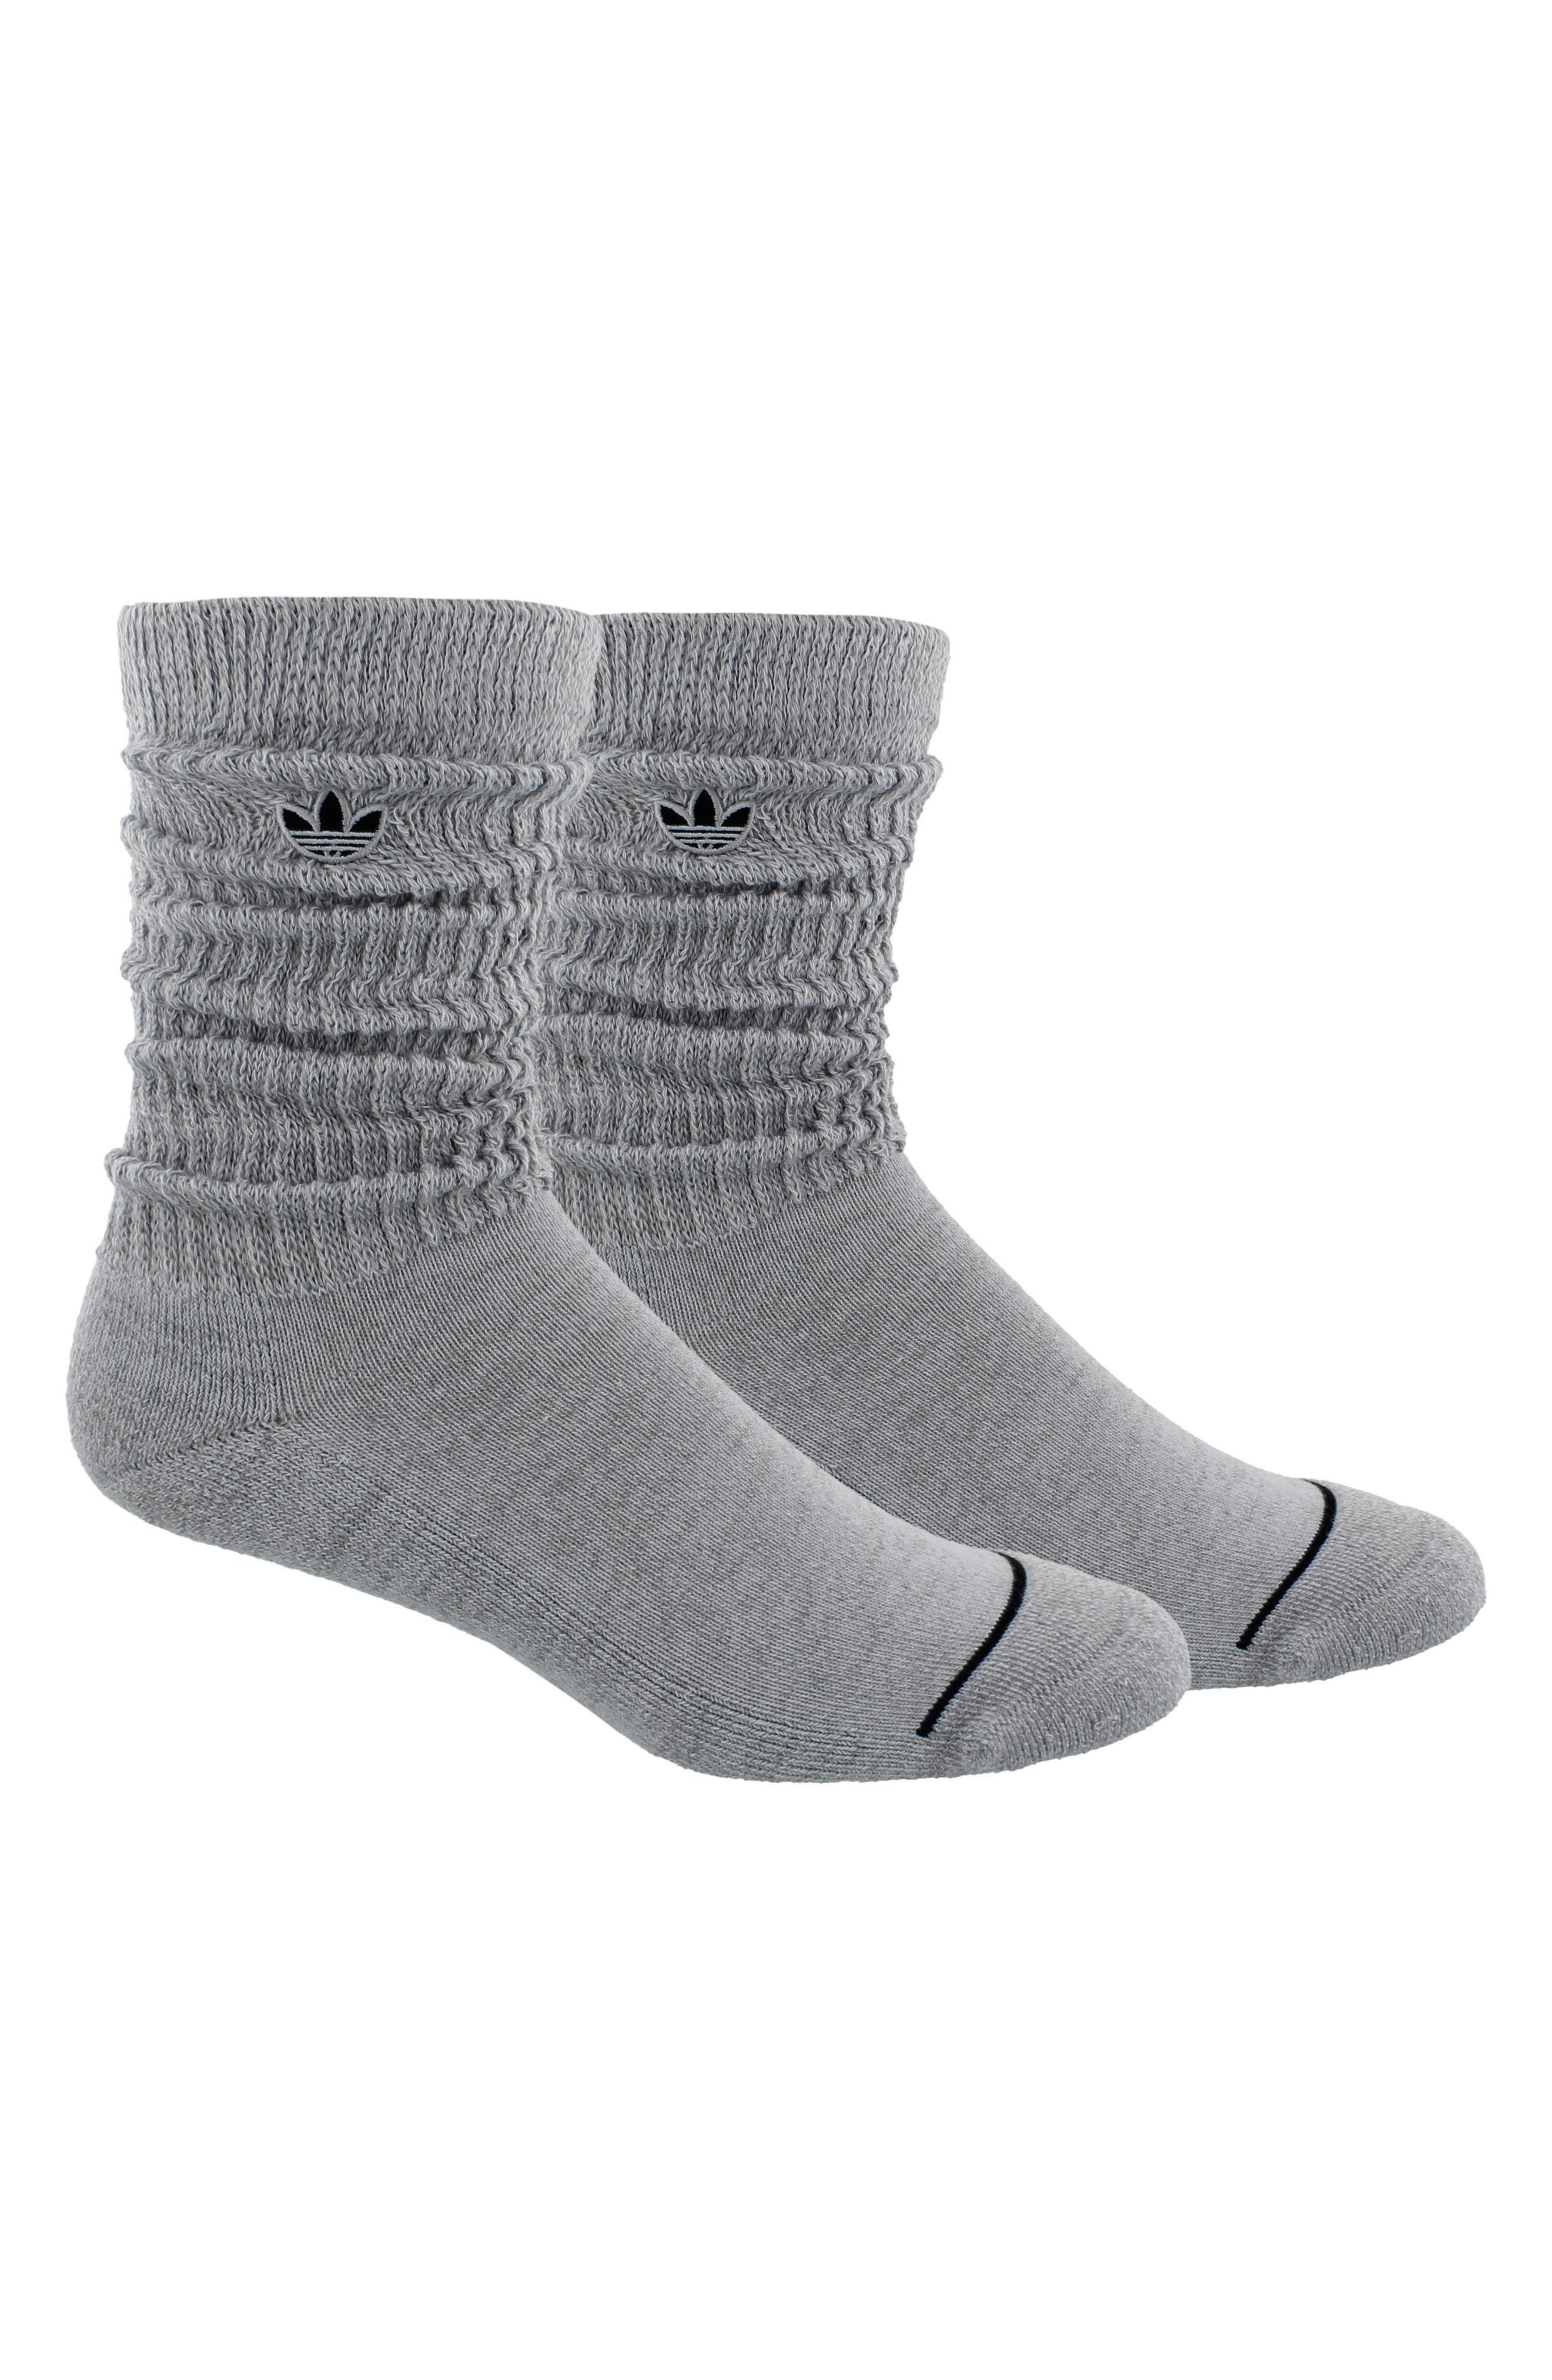 Slouch Crew Socks,                         Main,                         color,